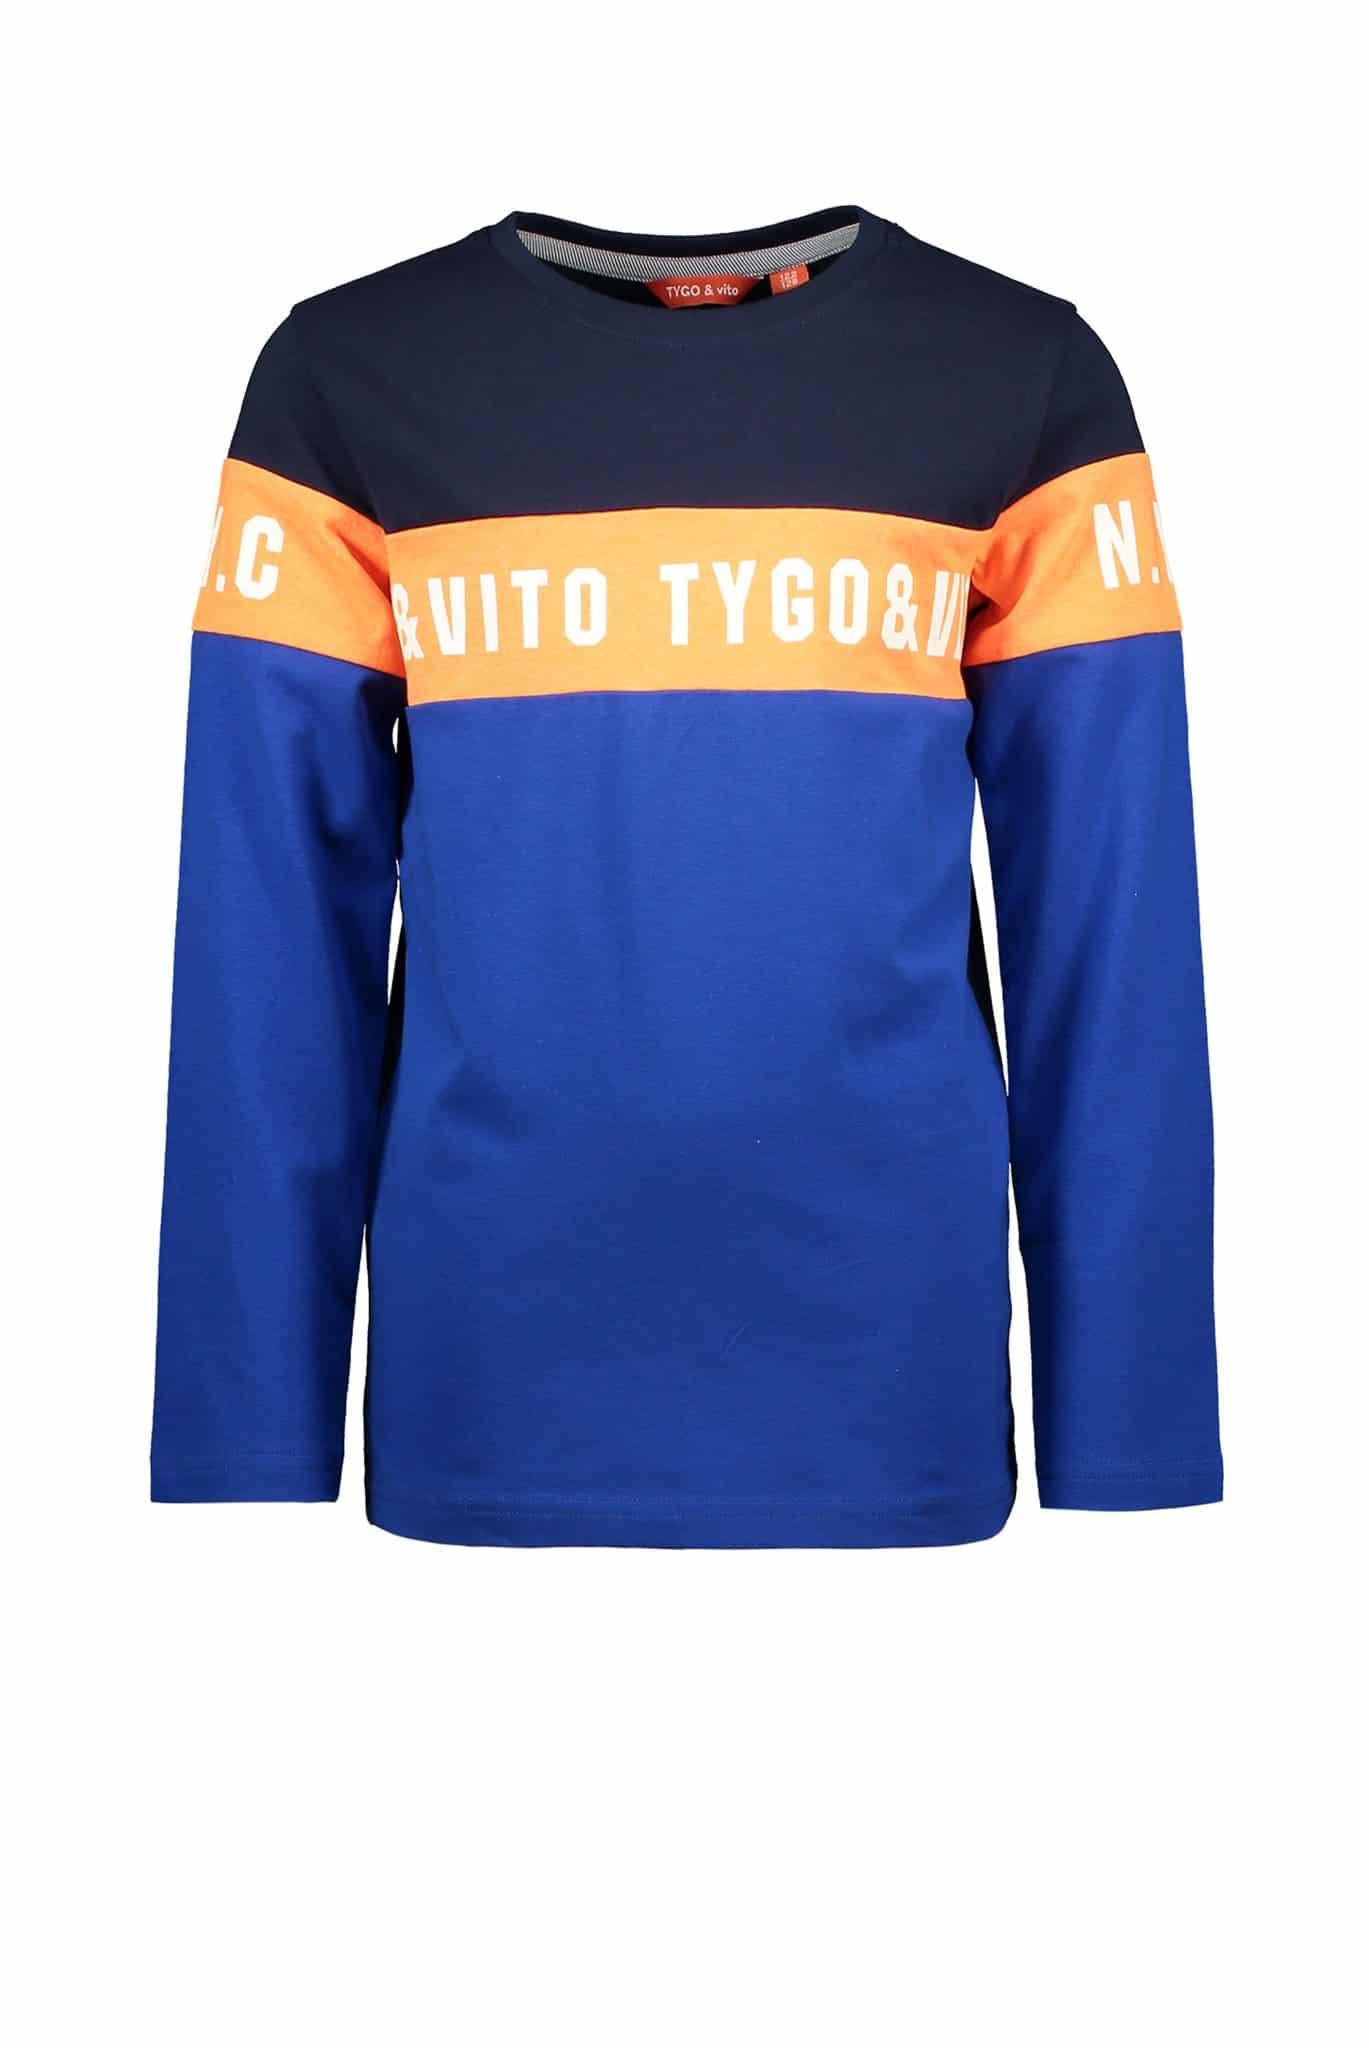 Tygo & Vito LS colorblock